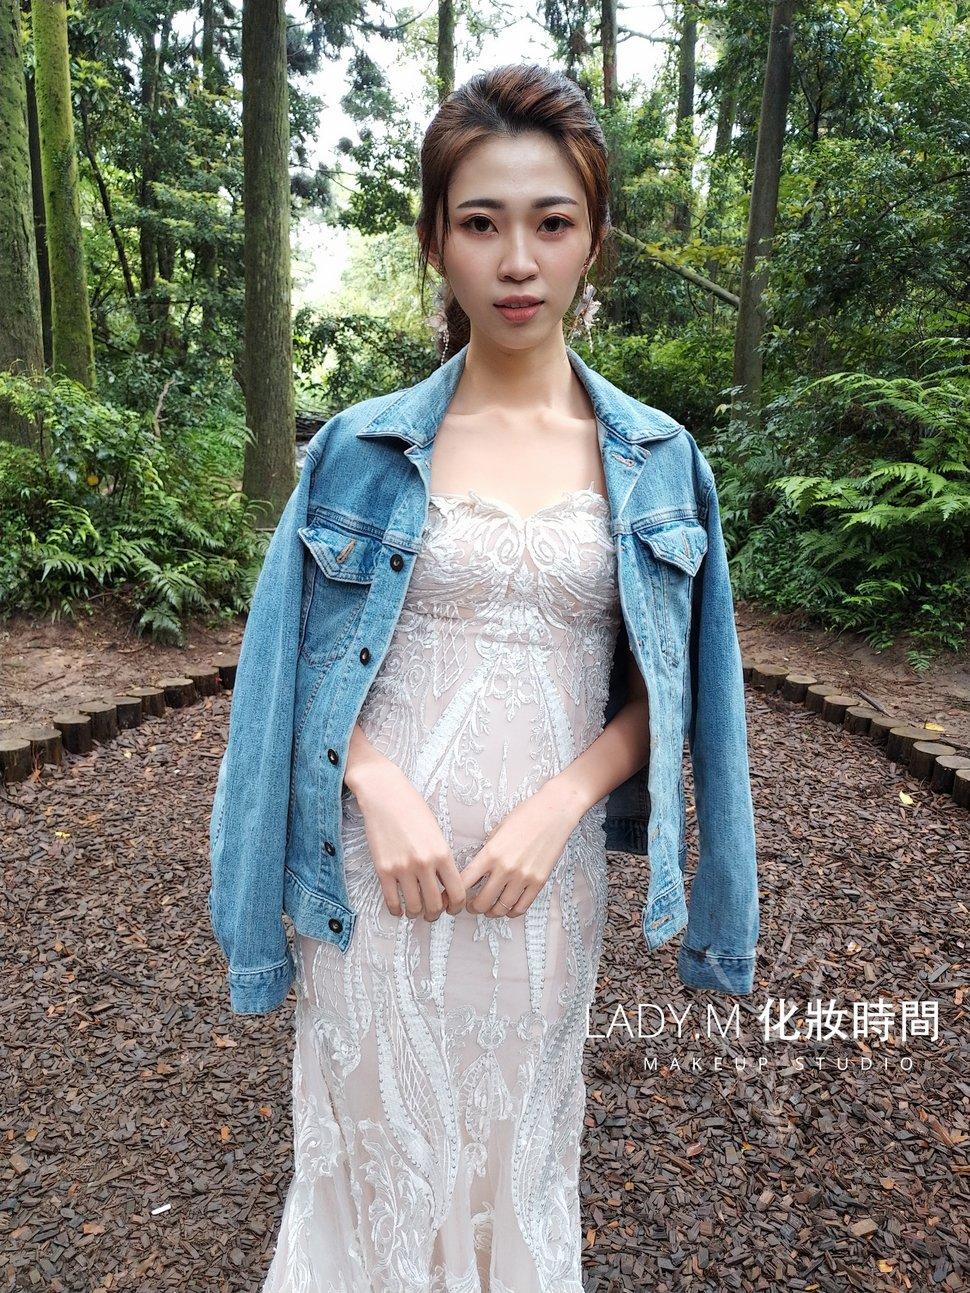 Photo_1555427854442 - LadyM化妝時間•Mia makeup - 結婚吧